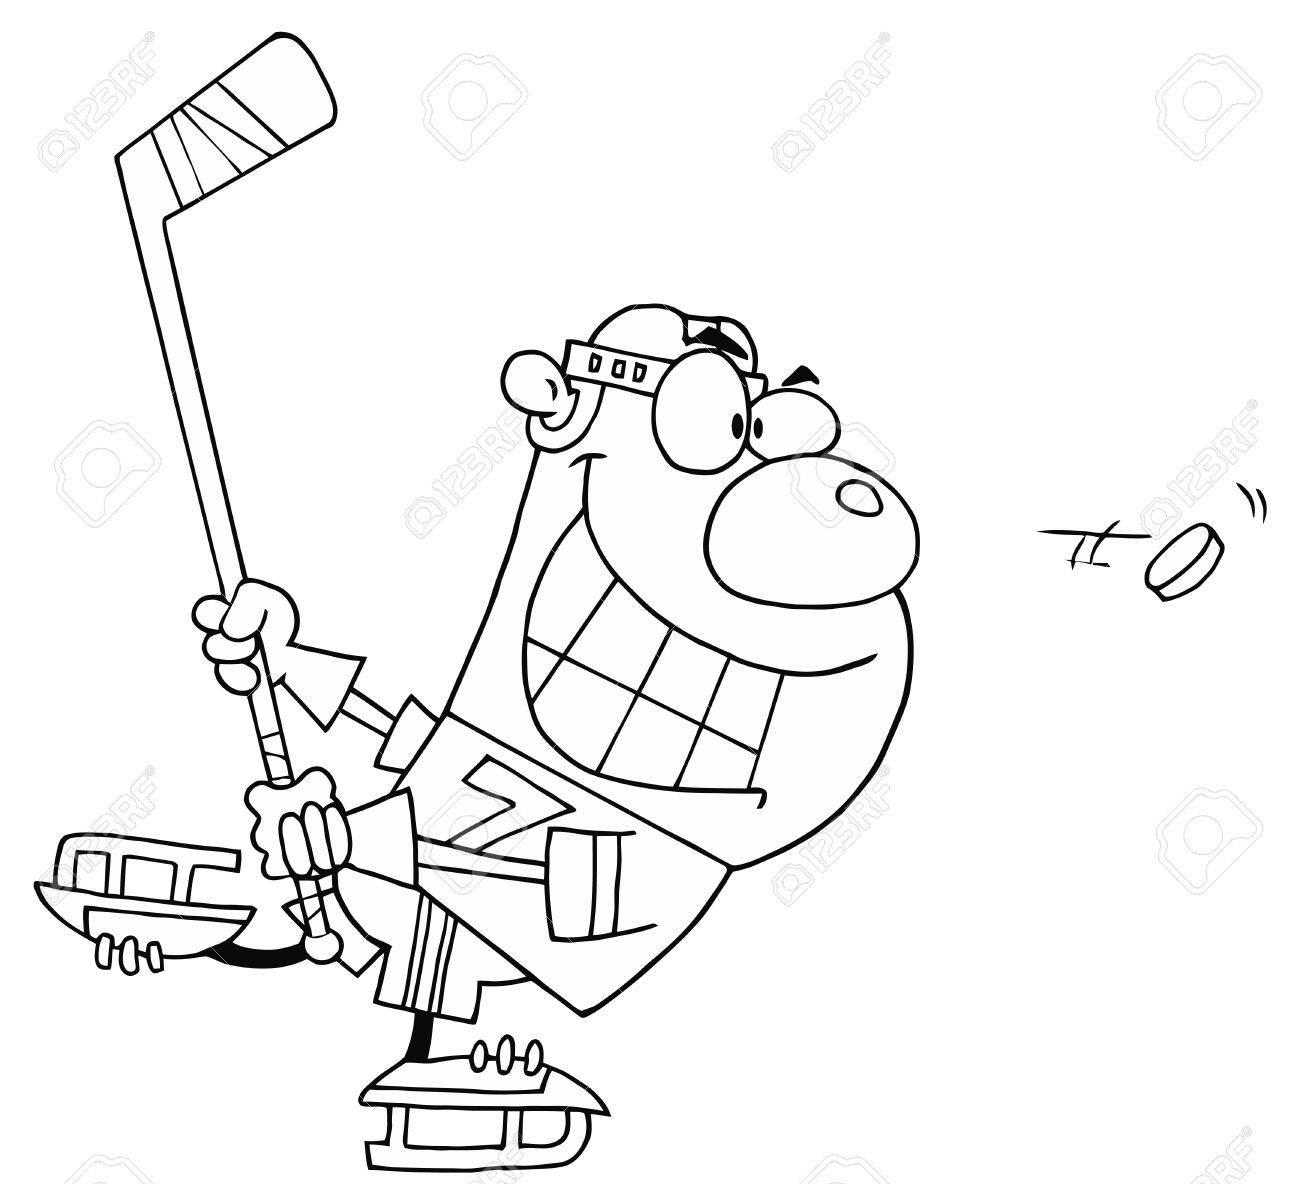 Outlined Hockey Bear Stock Vector - 16386836